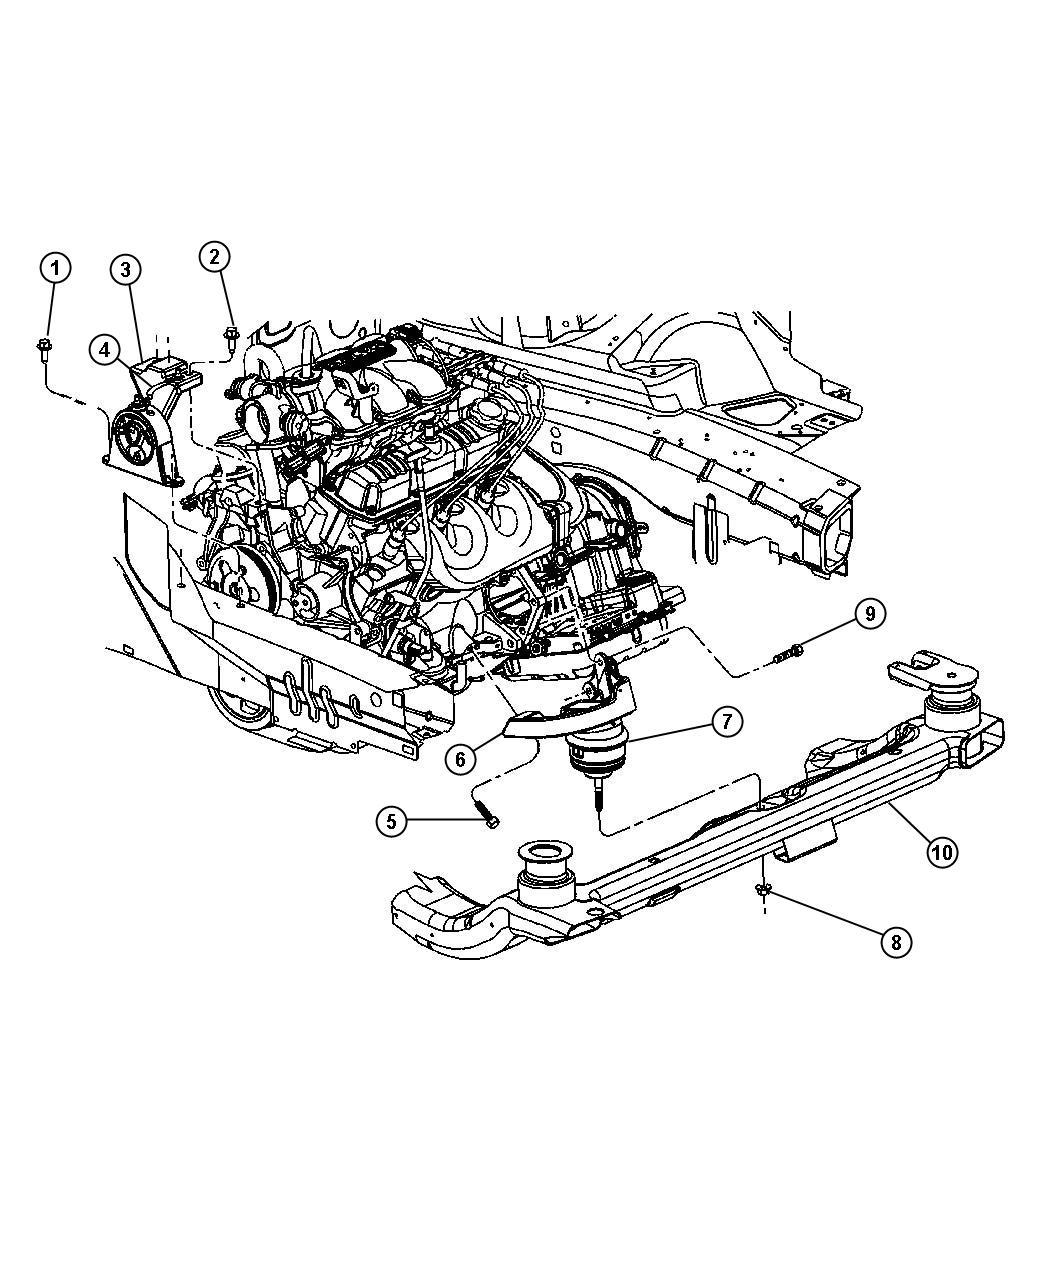 saturn v f1 engine diagram free wiring diagram images